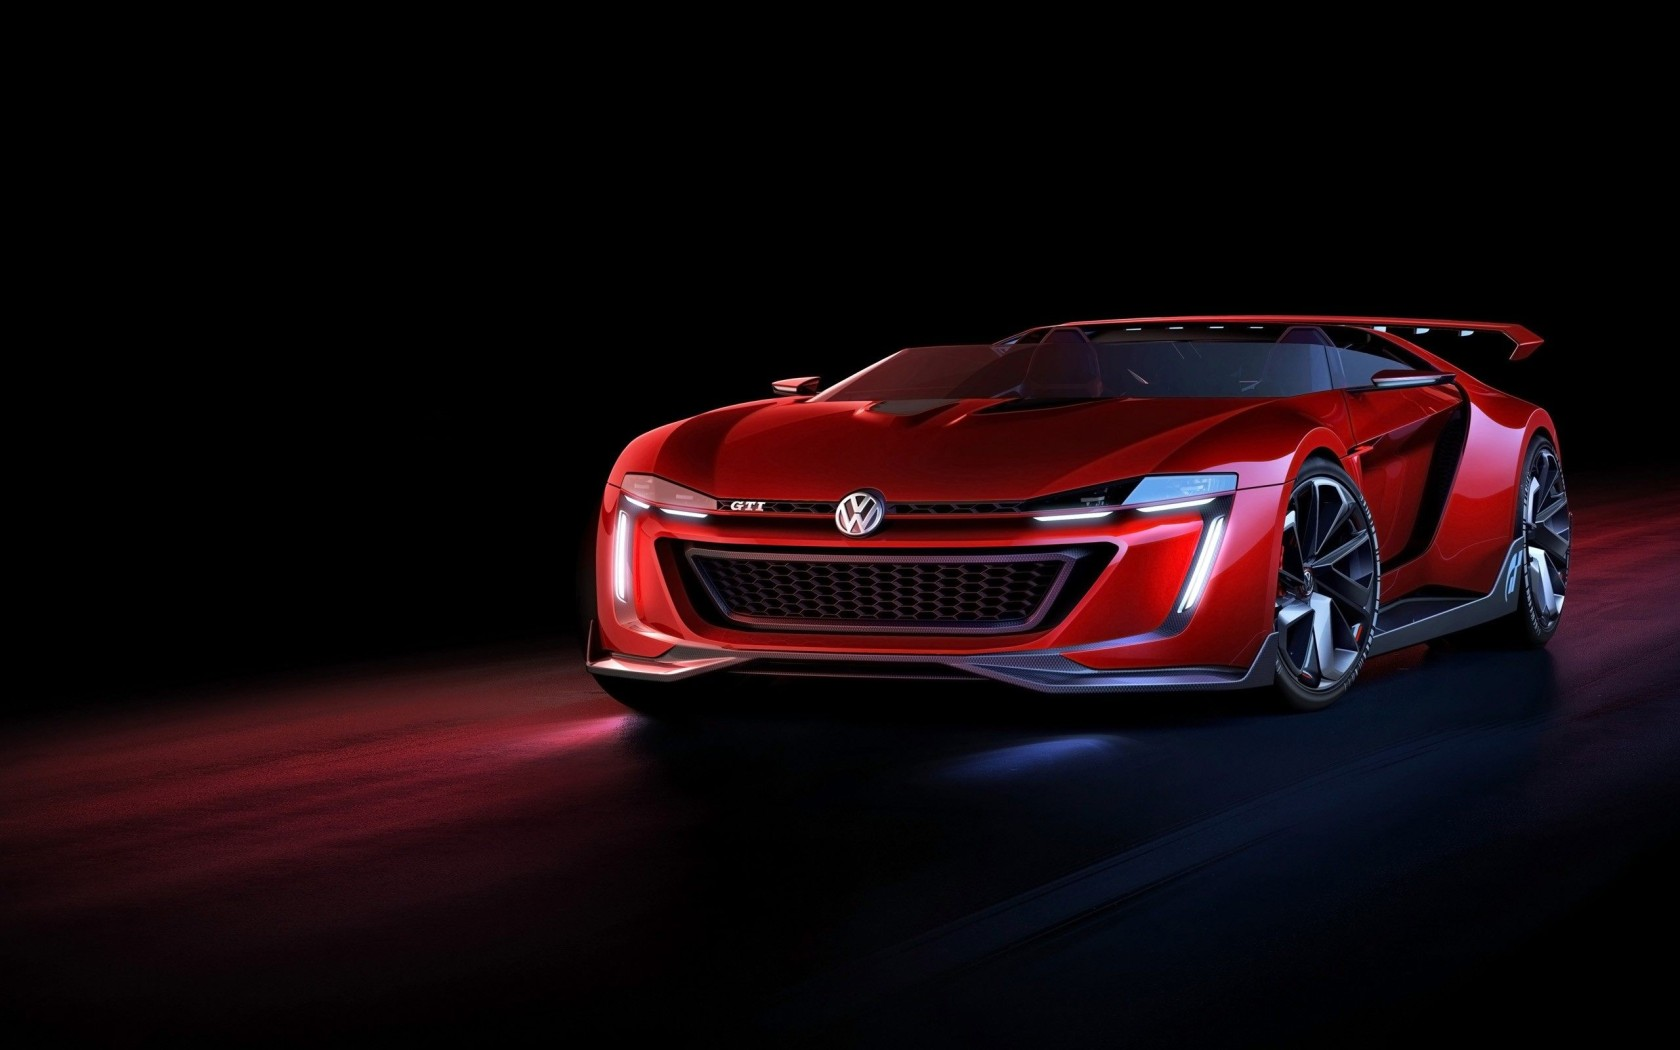 vw-gti-roadster-red-car-wallpaper-1680×1050